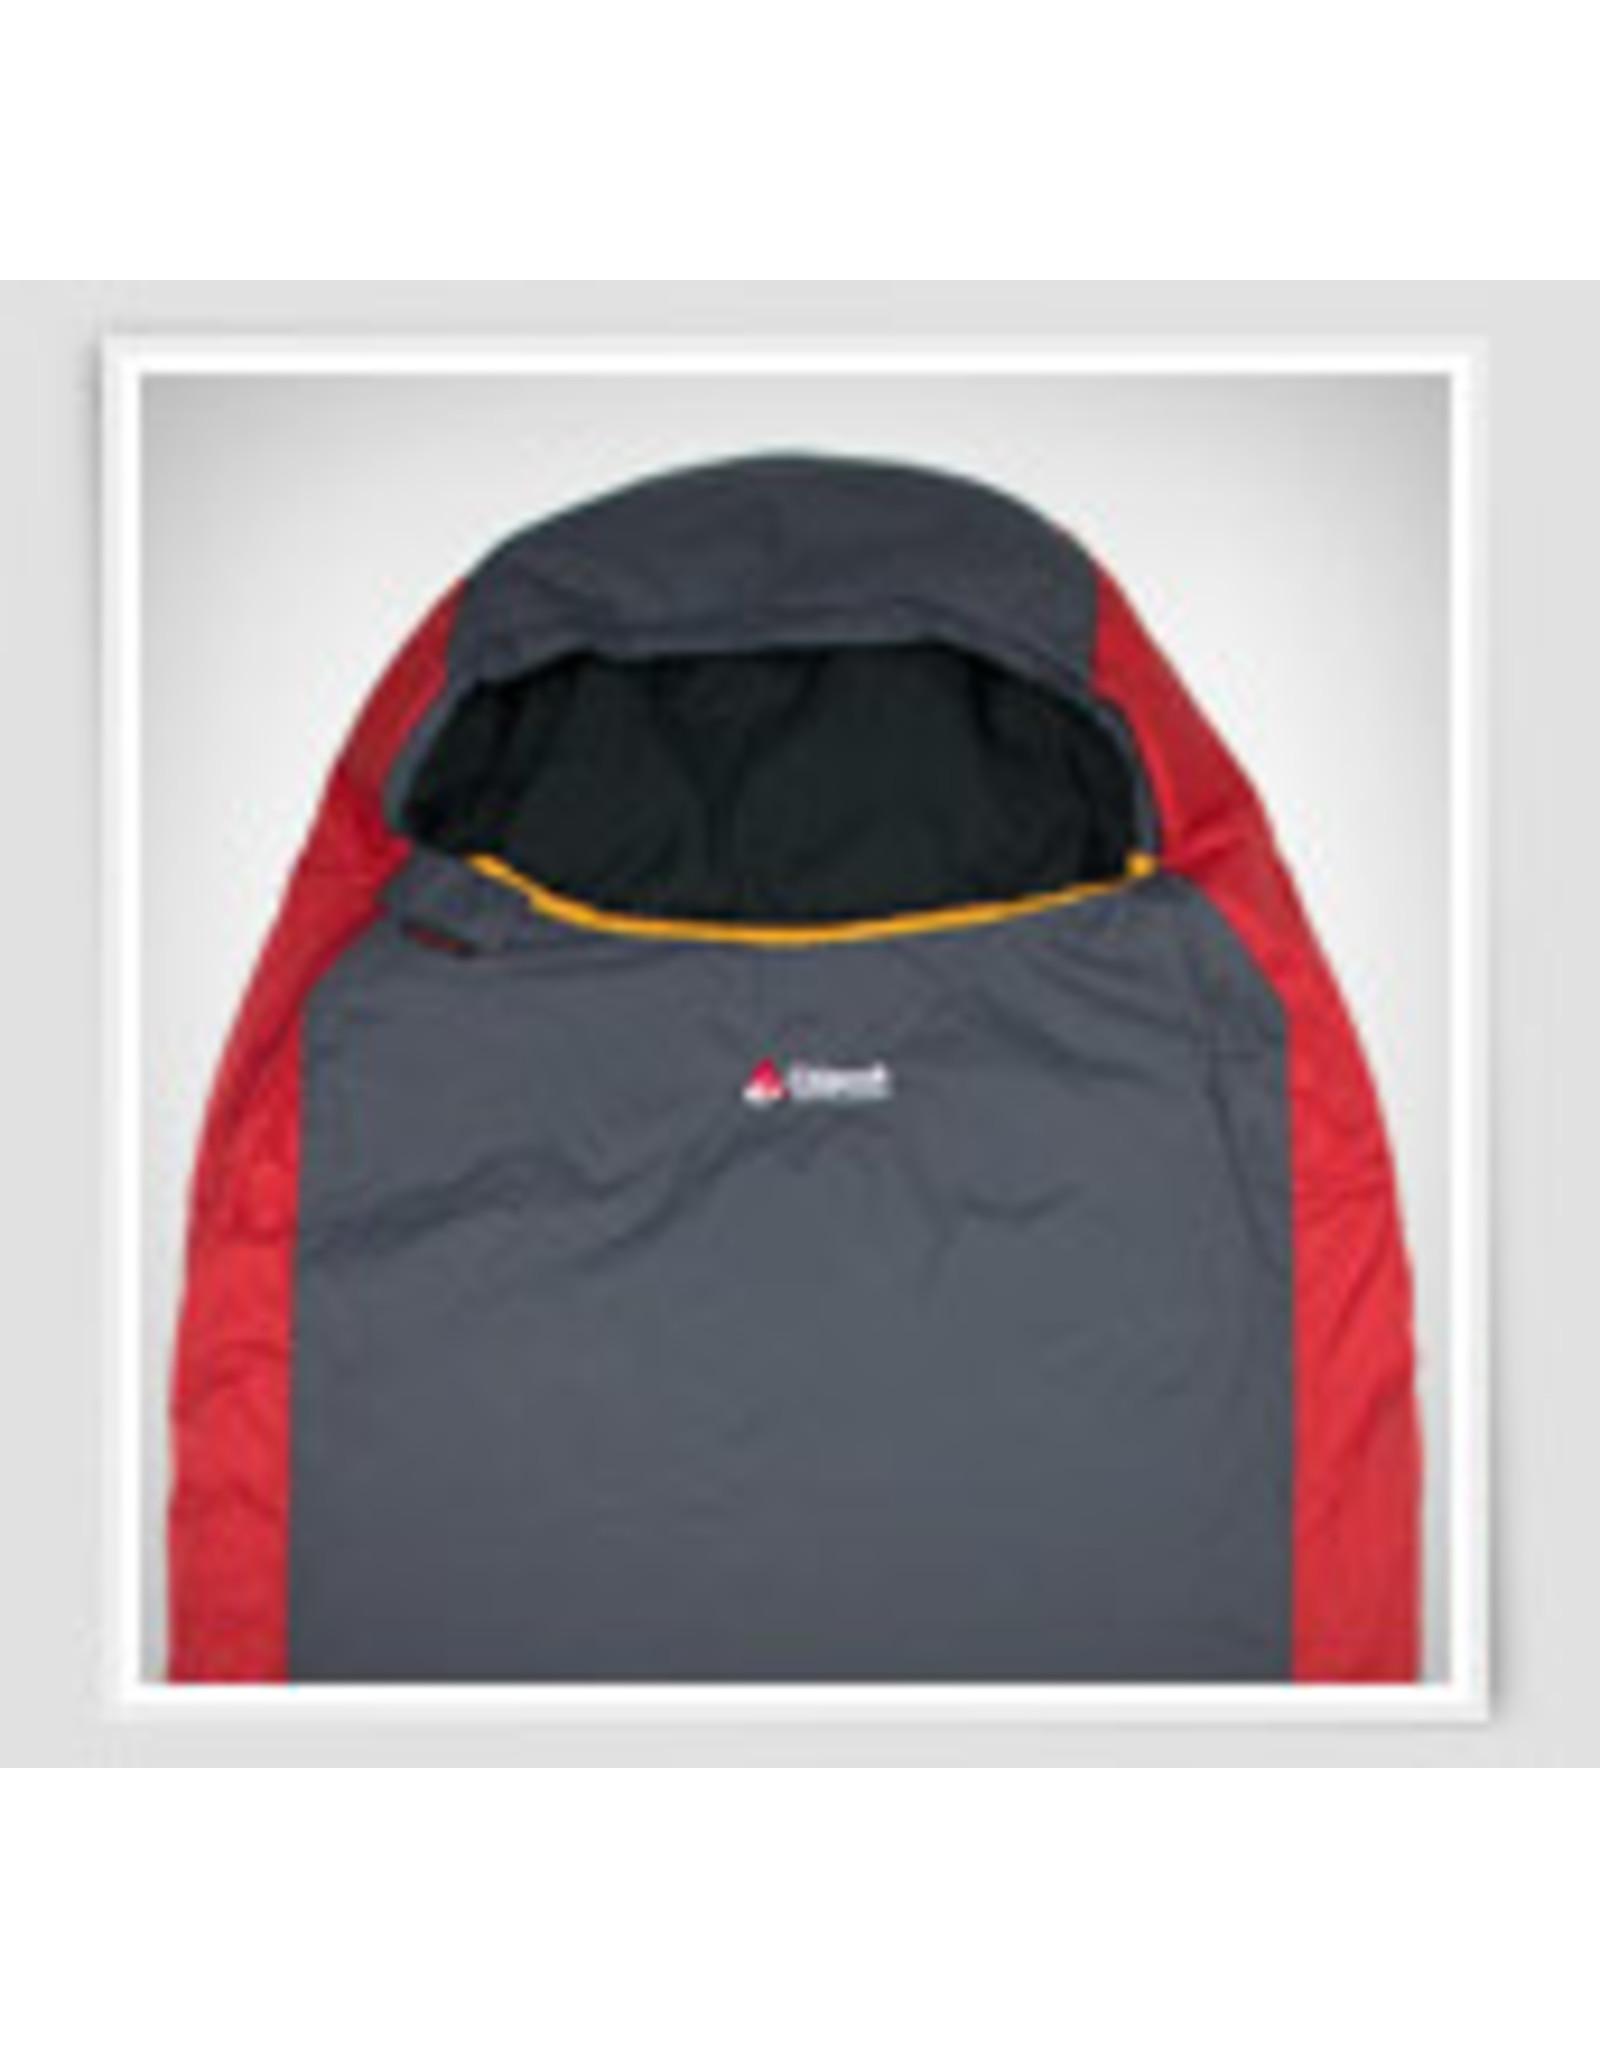 CHINOOK TECHNICAL OUTDOOR Chinook Everest Micro II 32F Sleeping Bag